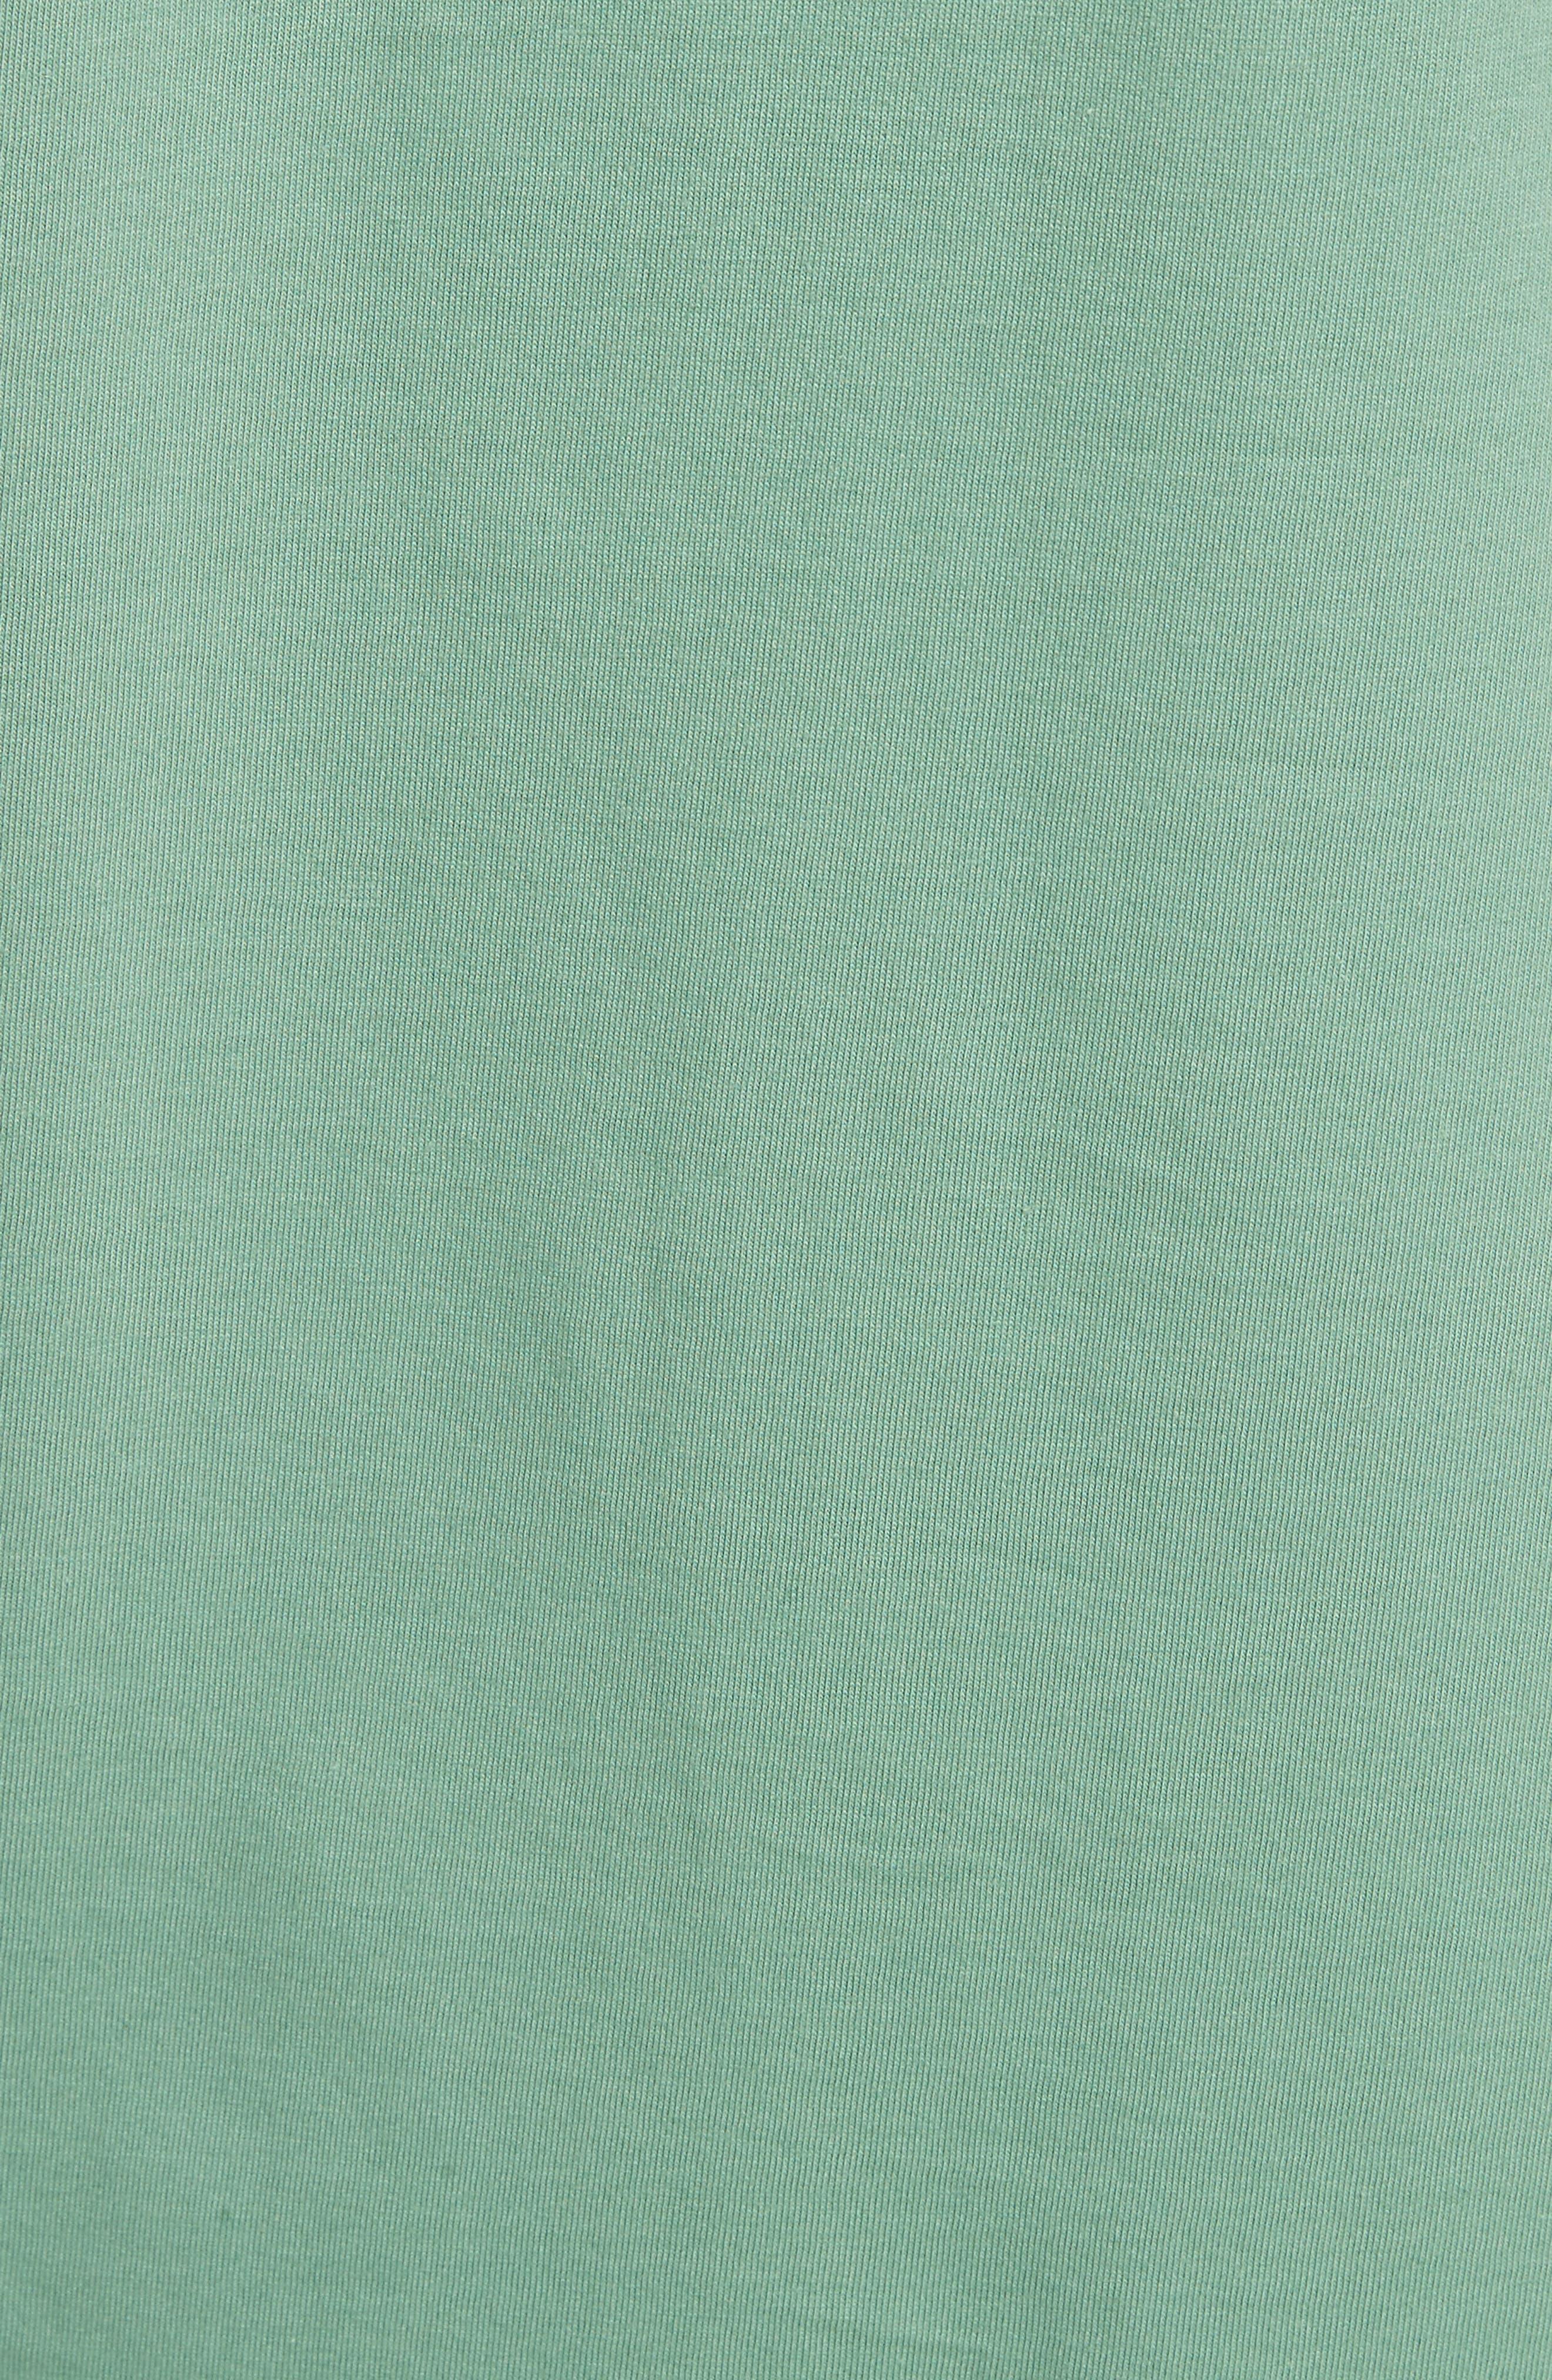 World Party T-Shirt,                             Alternate thumbnail 5, color,